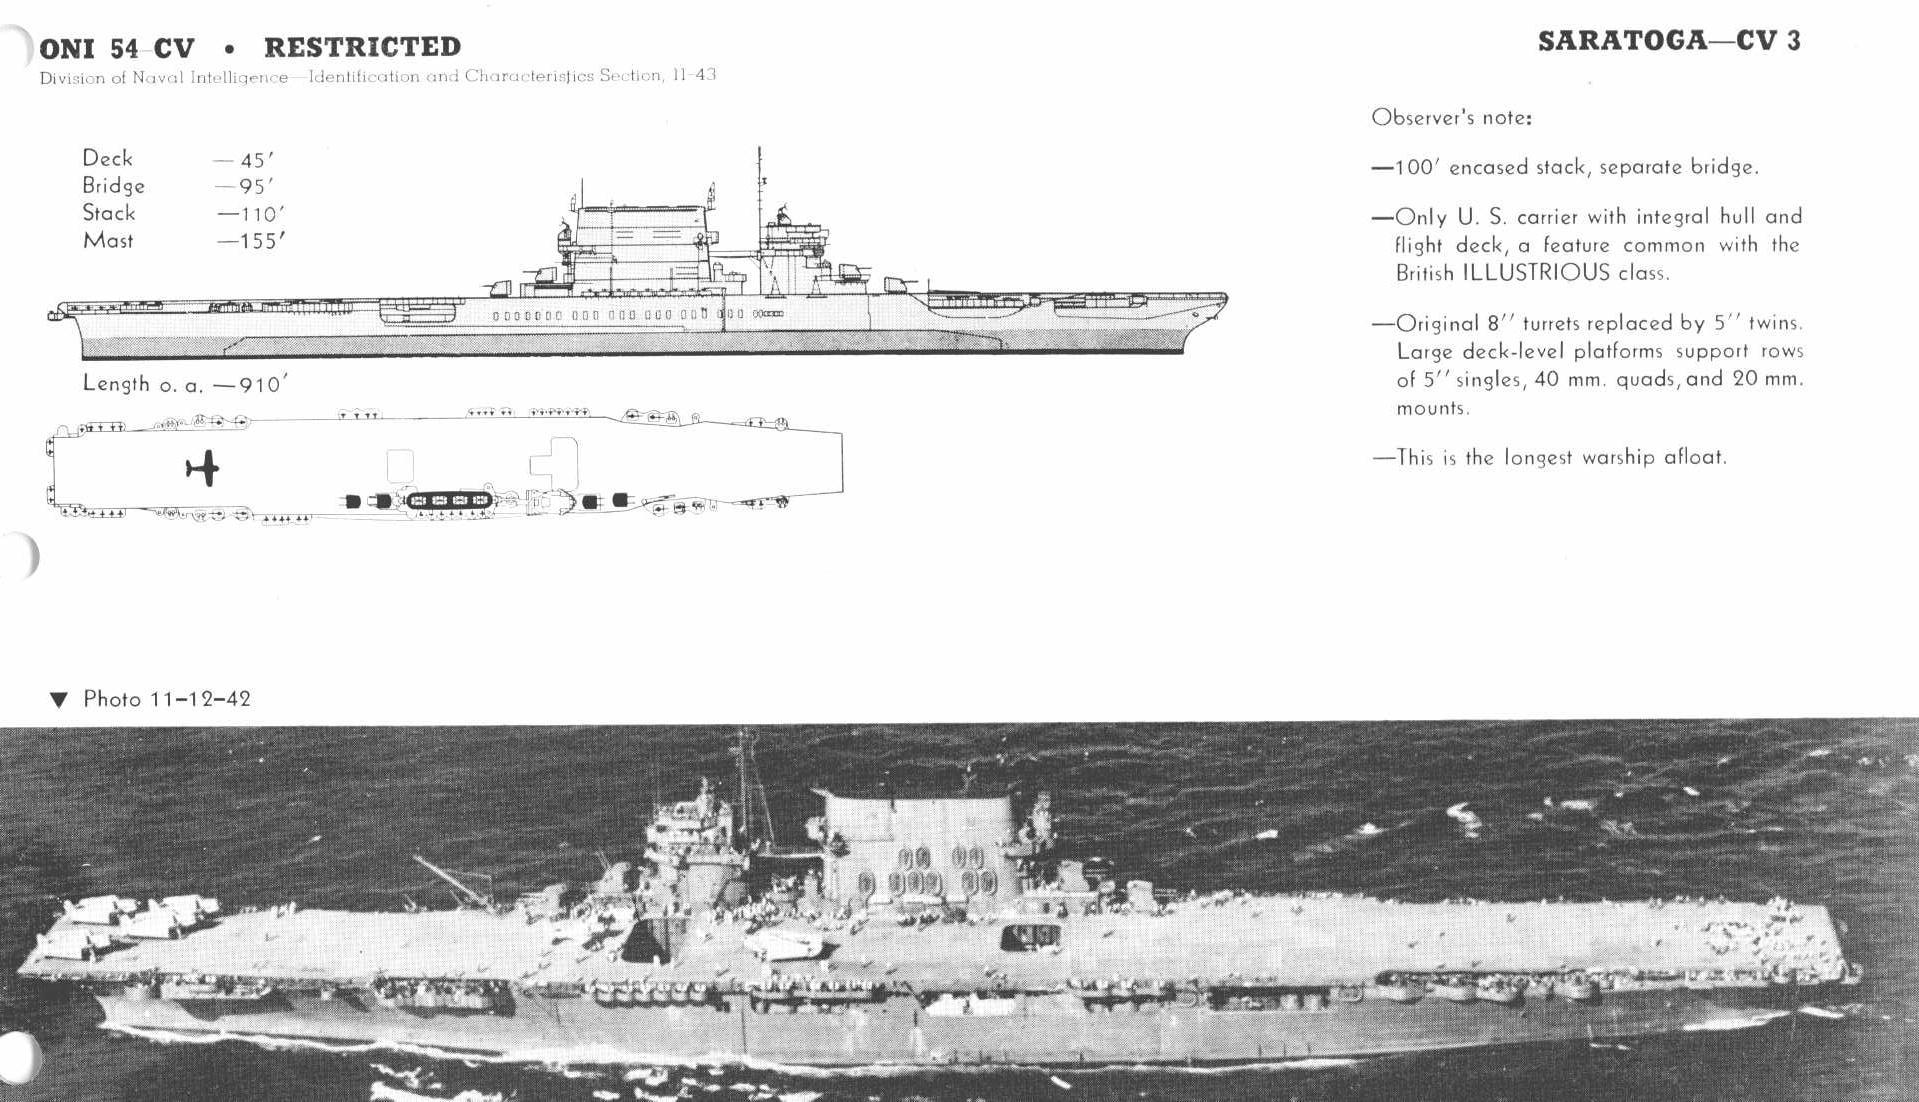 hight resolution of saratoga and lexington class fleet carriers